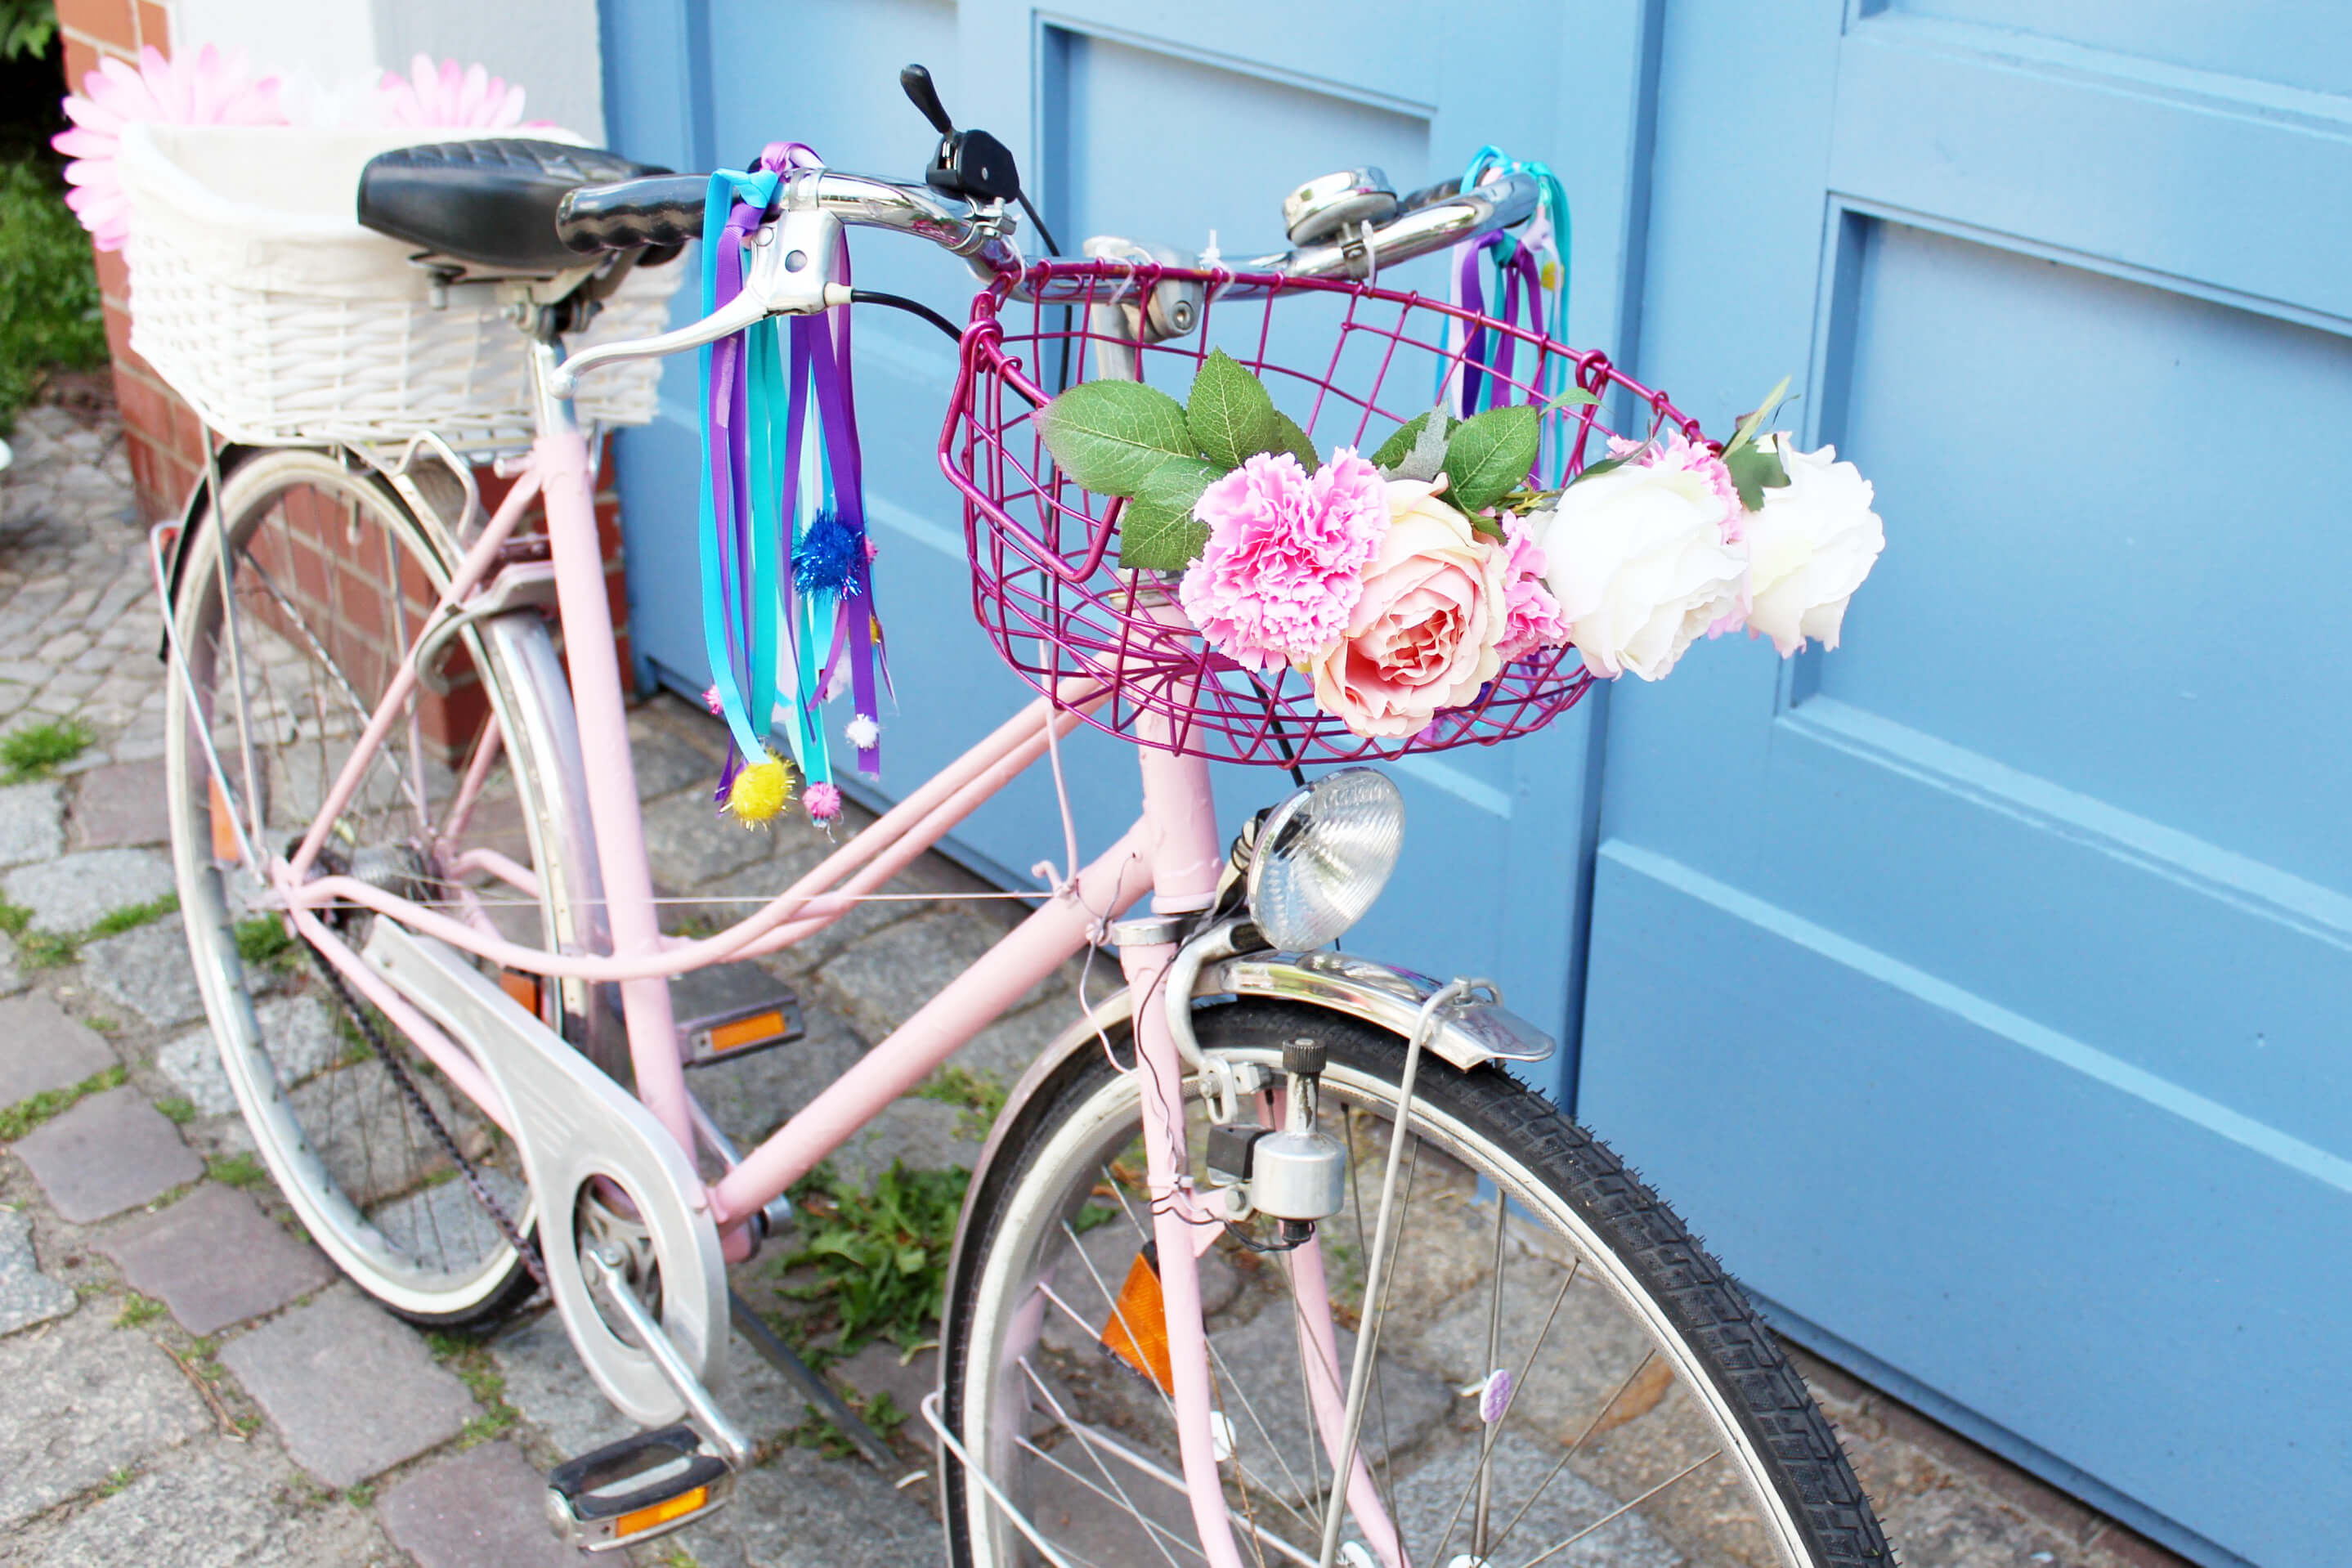 DIY Fahrrad upcyceln: 4 geniale Ideen, um dein Fahrrad aufzupimpen!